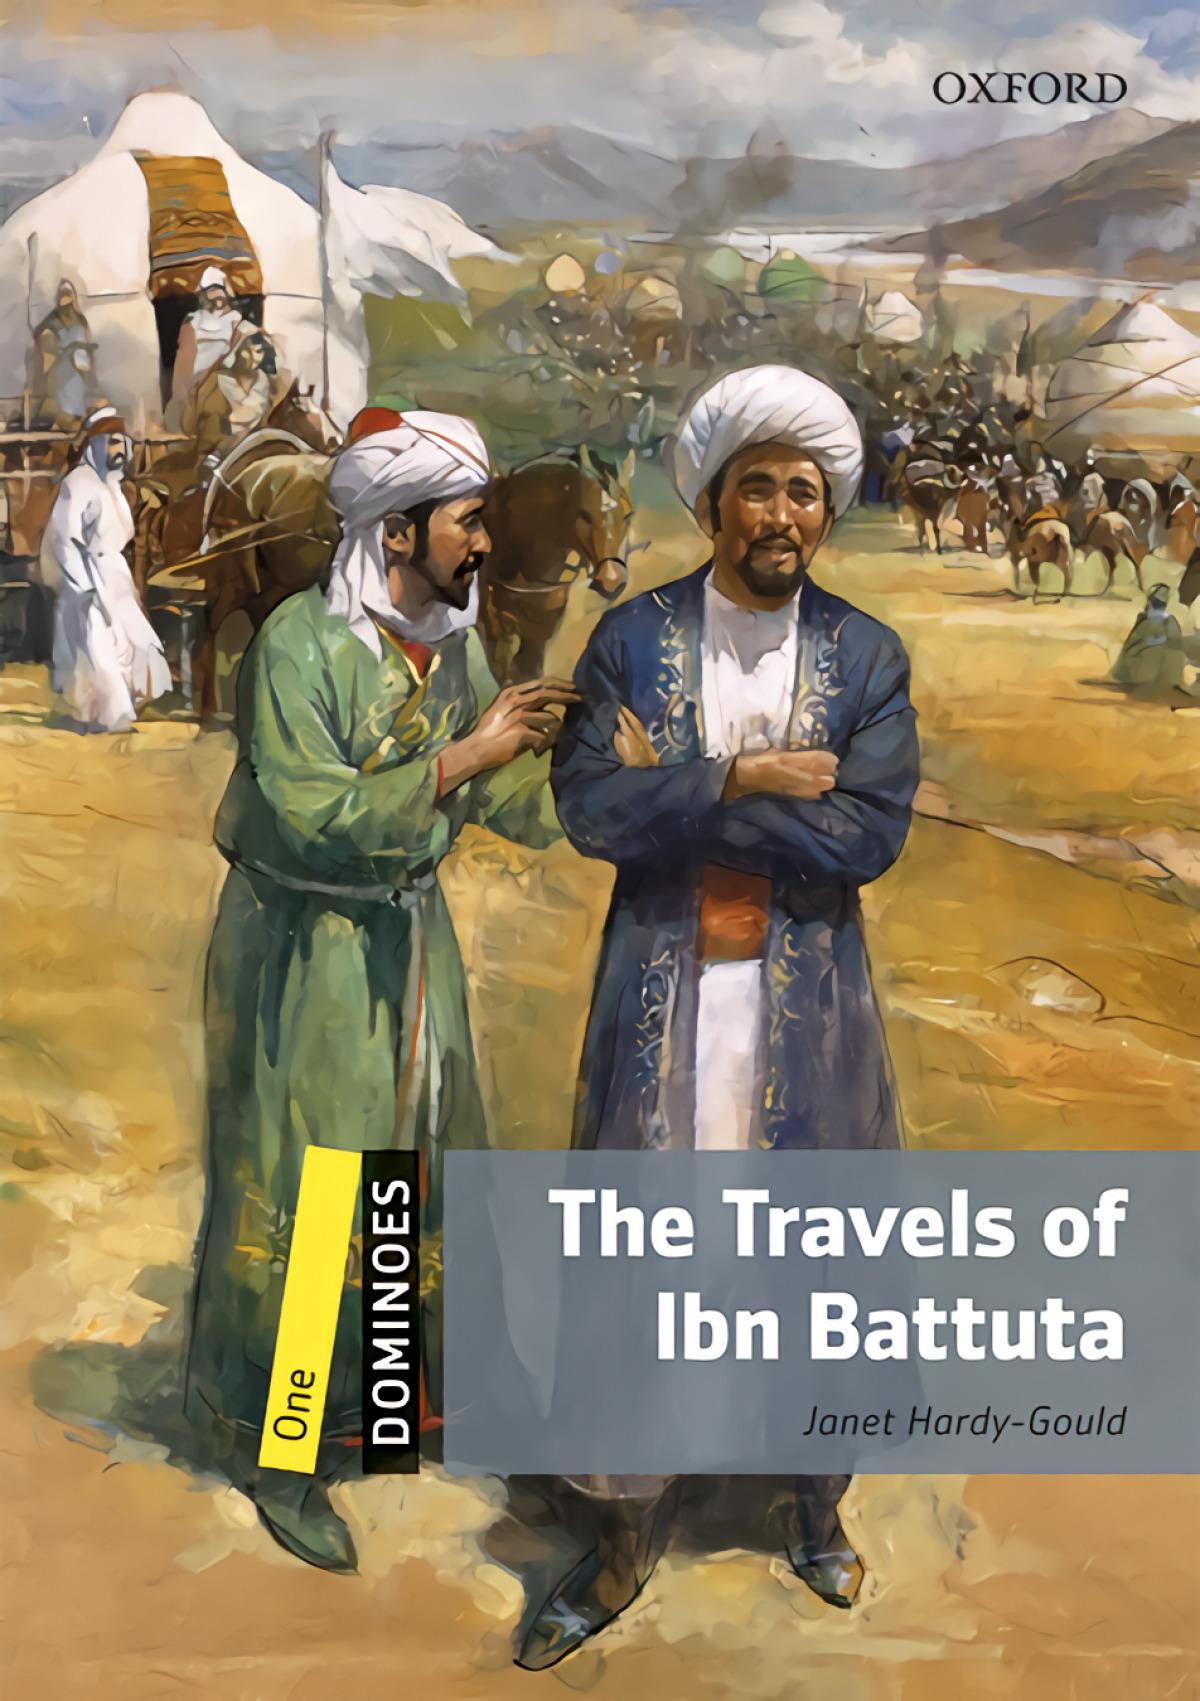 Dominoes 1. The Travels of Ibn Battuta MP3 Pack